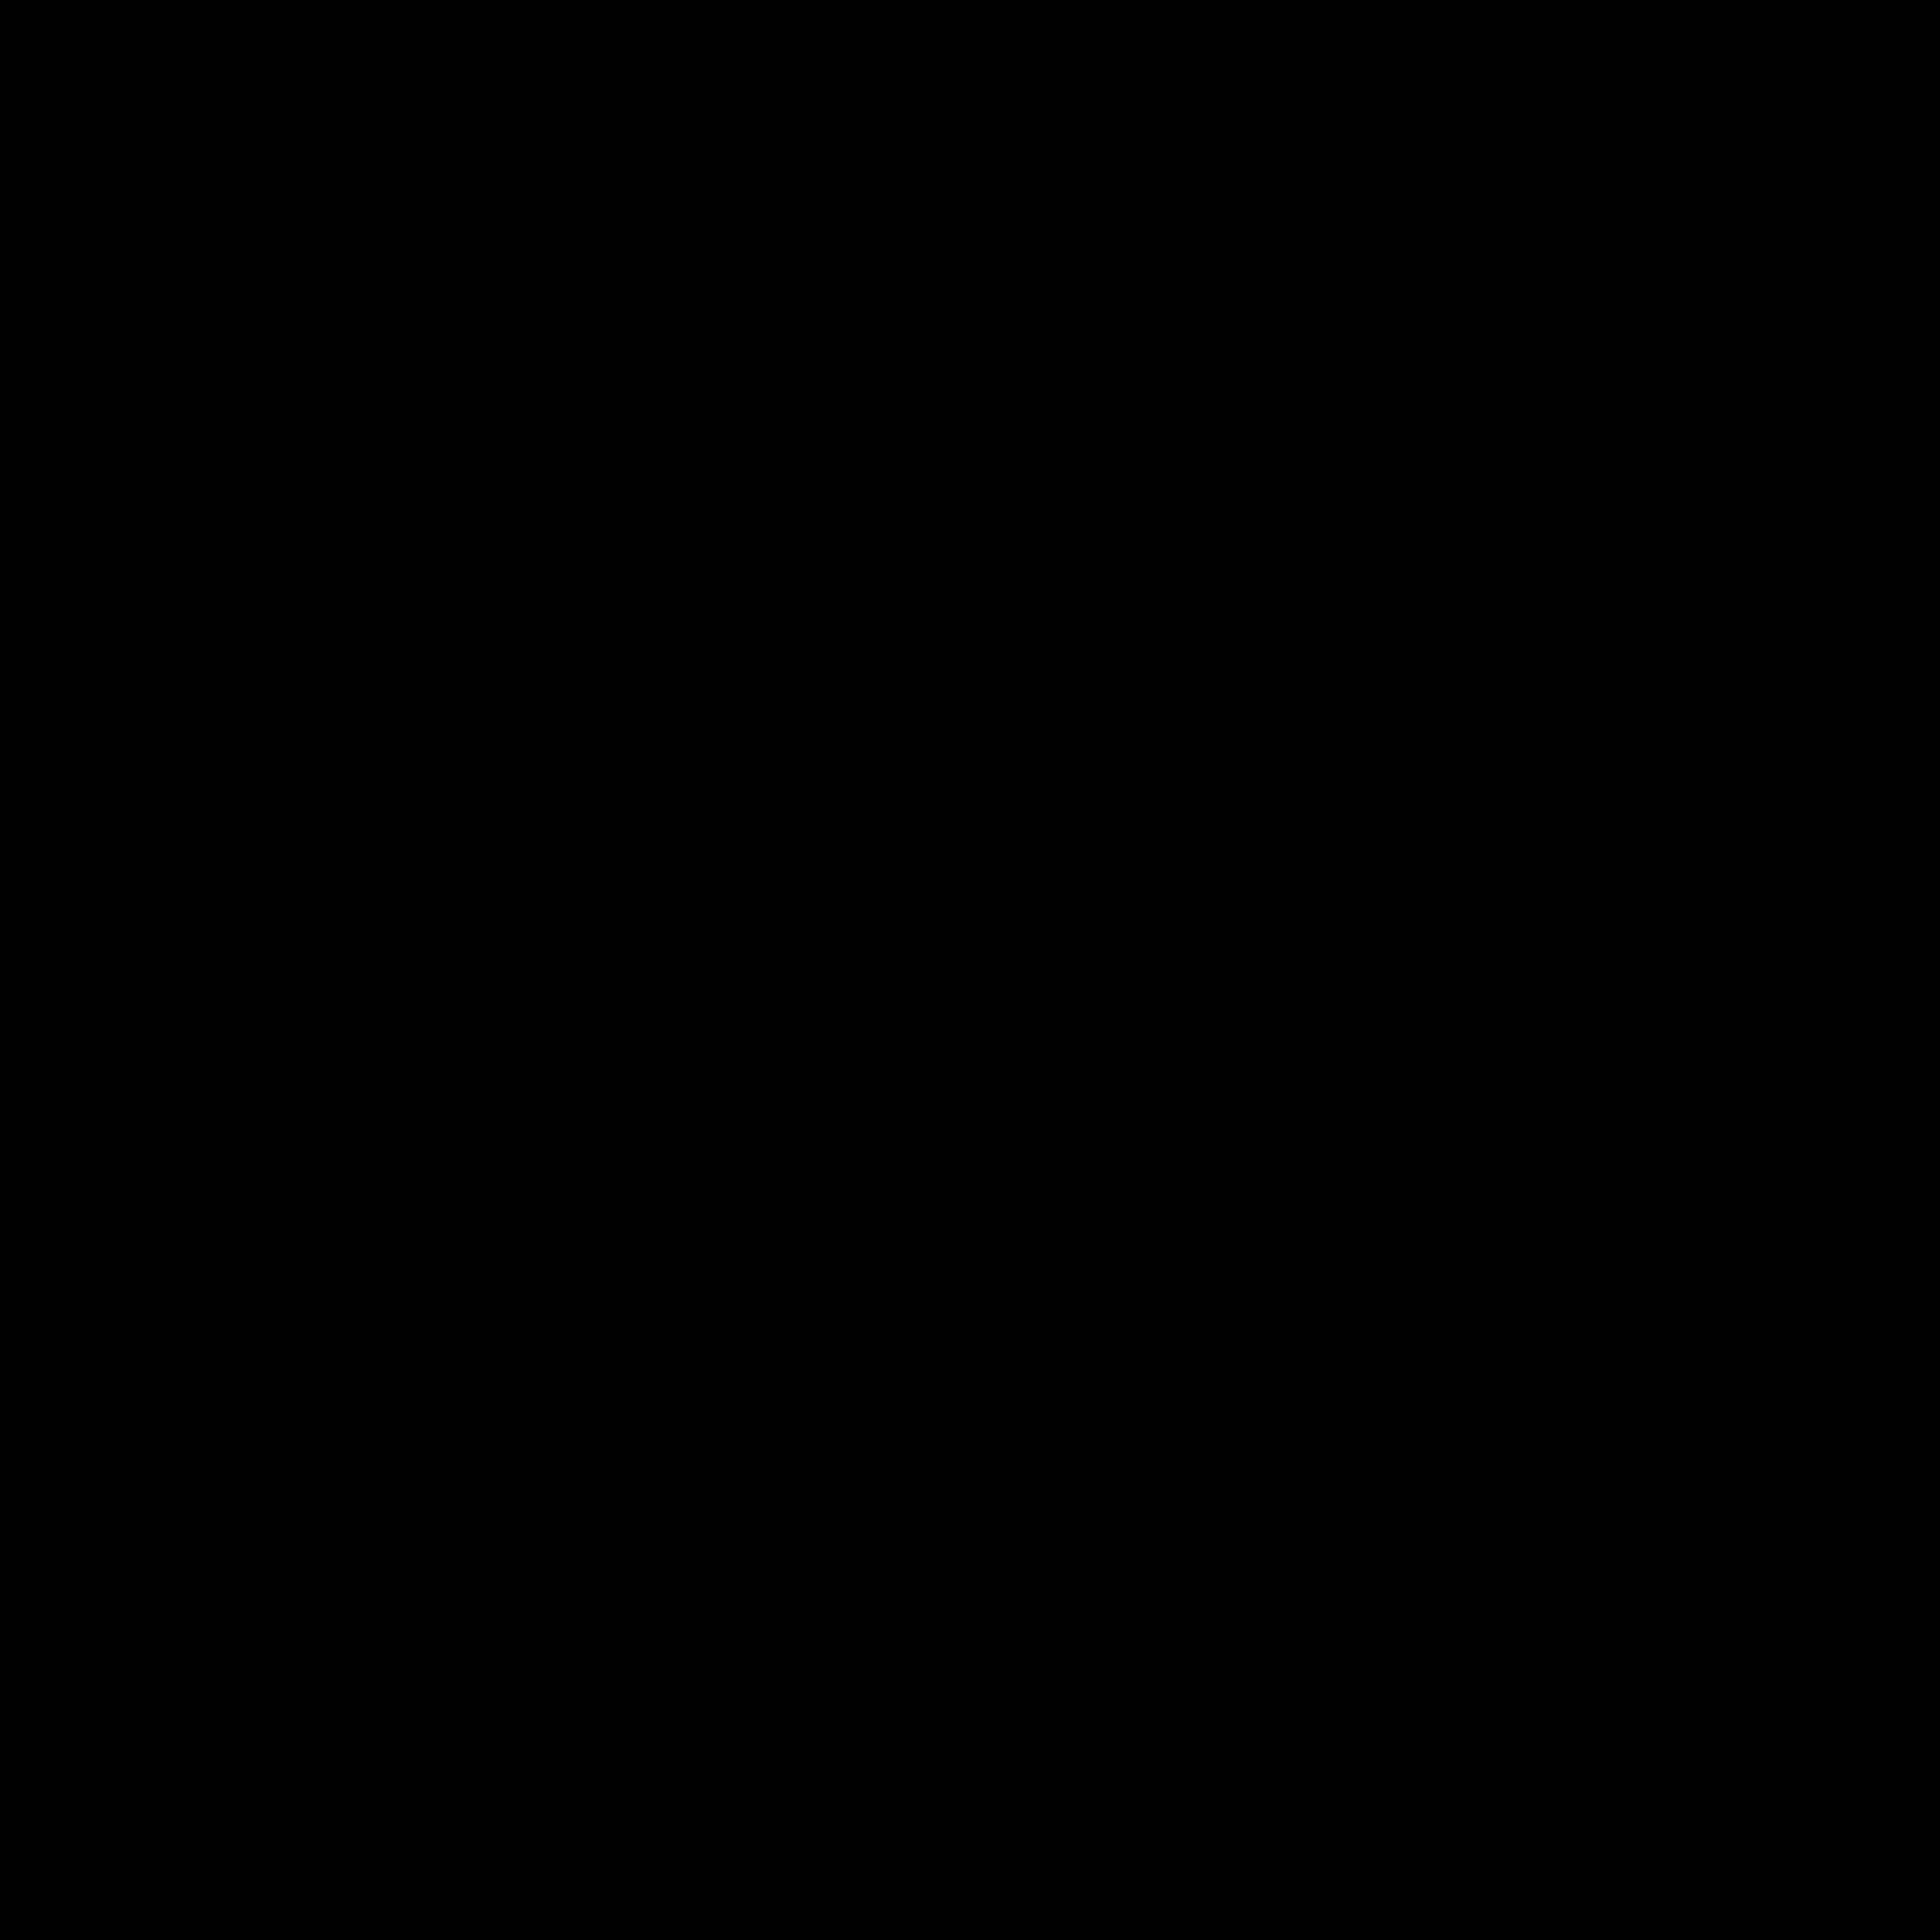 graphic transparent library Vector emblem black and white. Pepsi logo png transparent